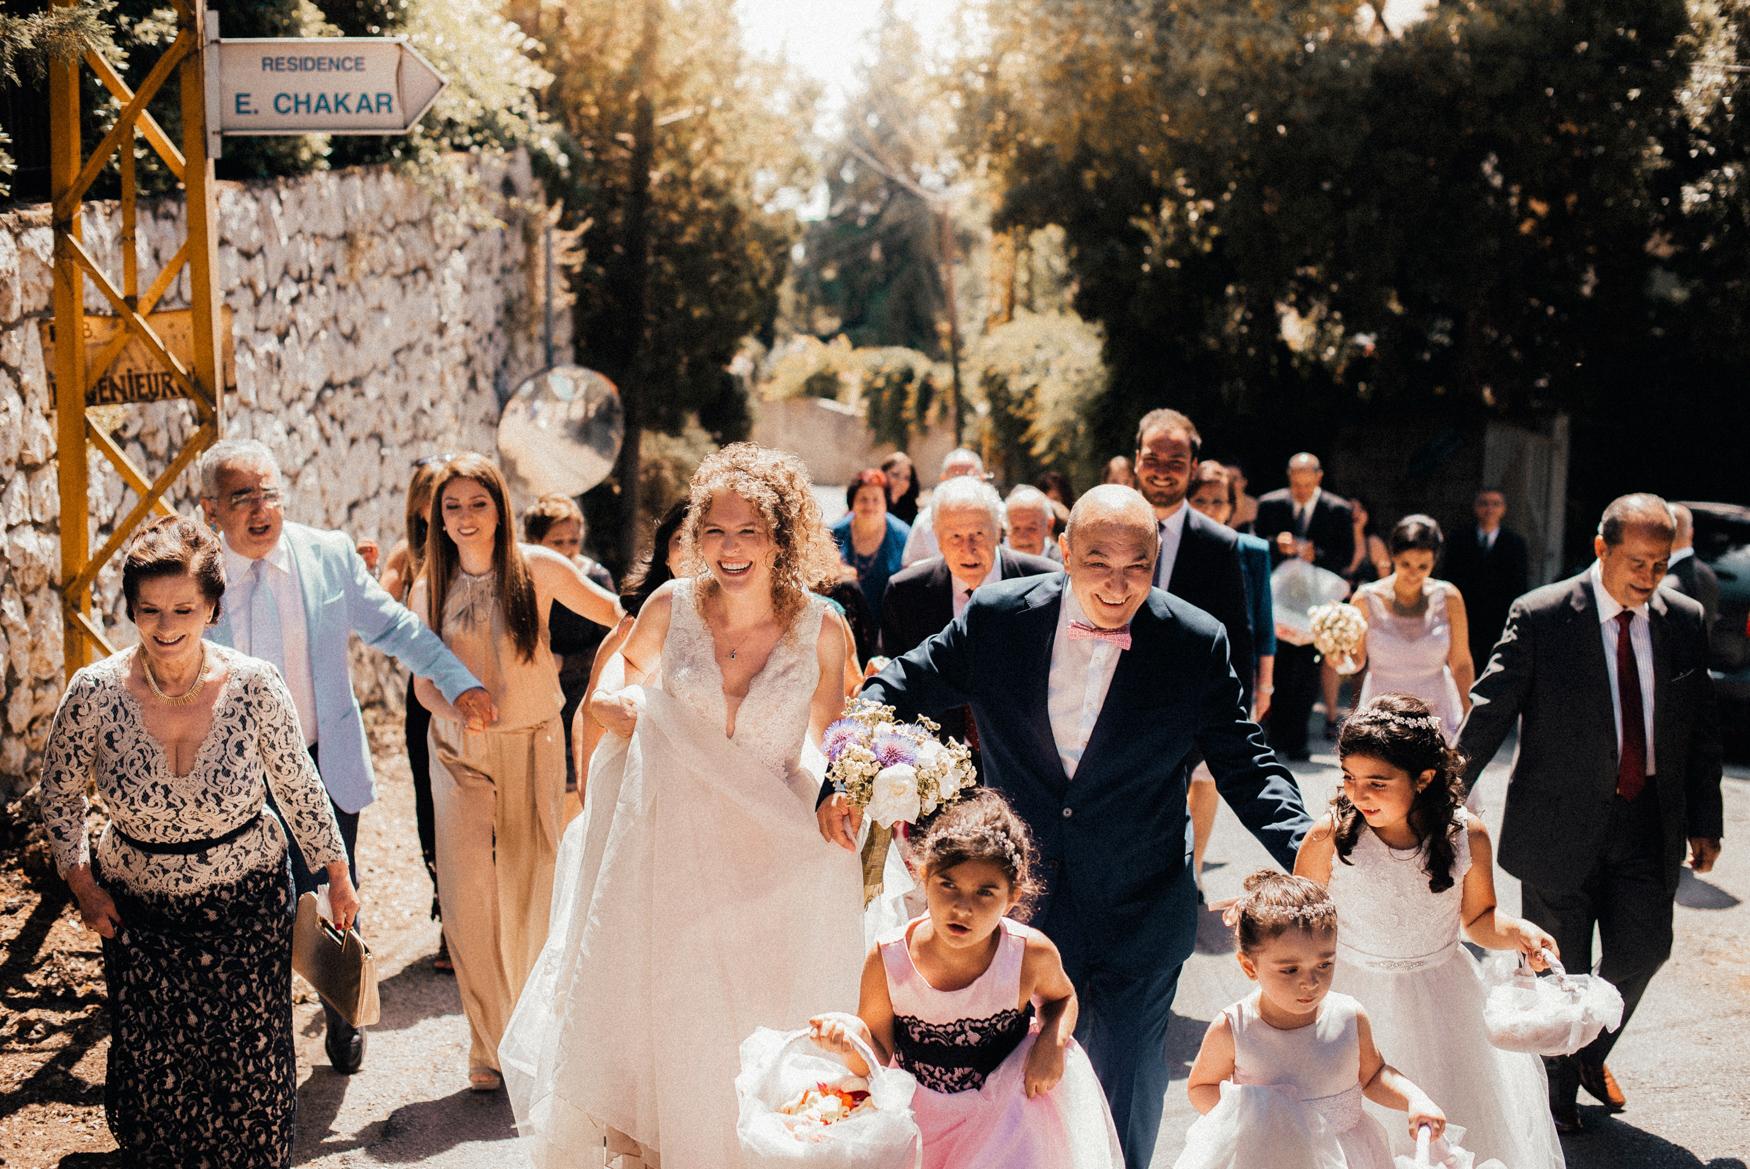 LR2 beirut byblos wedding photographer lebanon 035.jpg